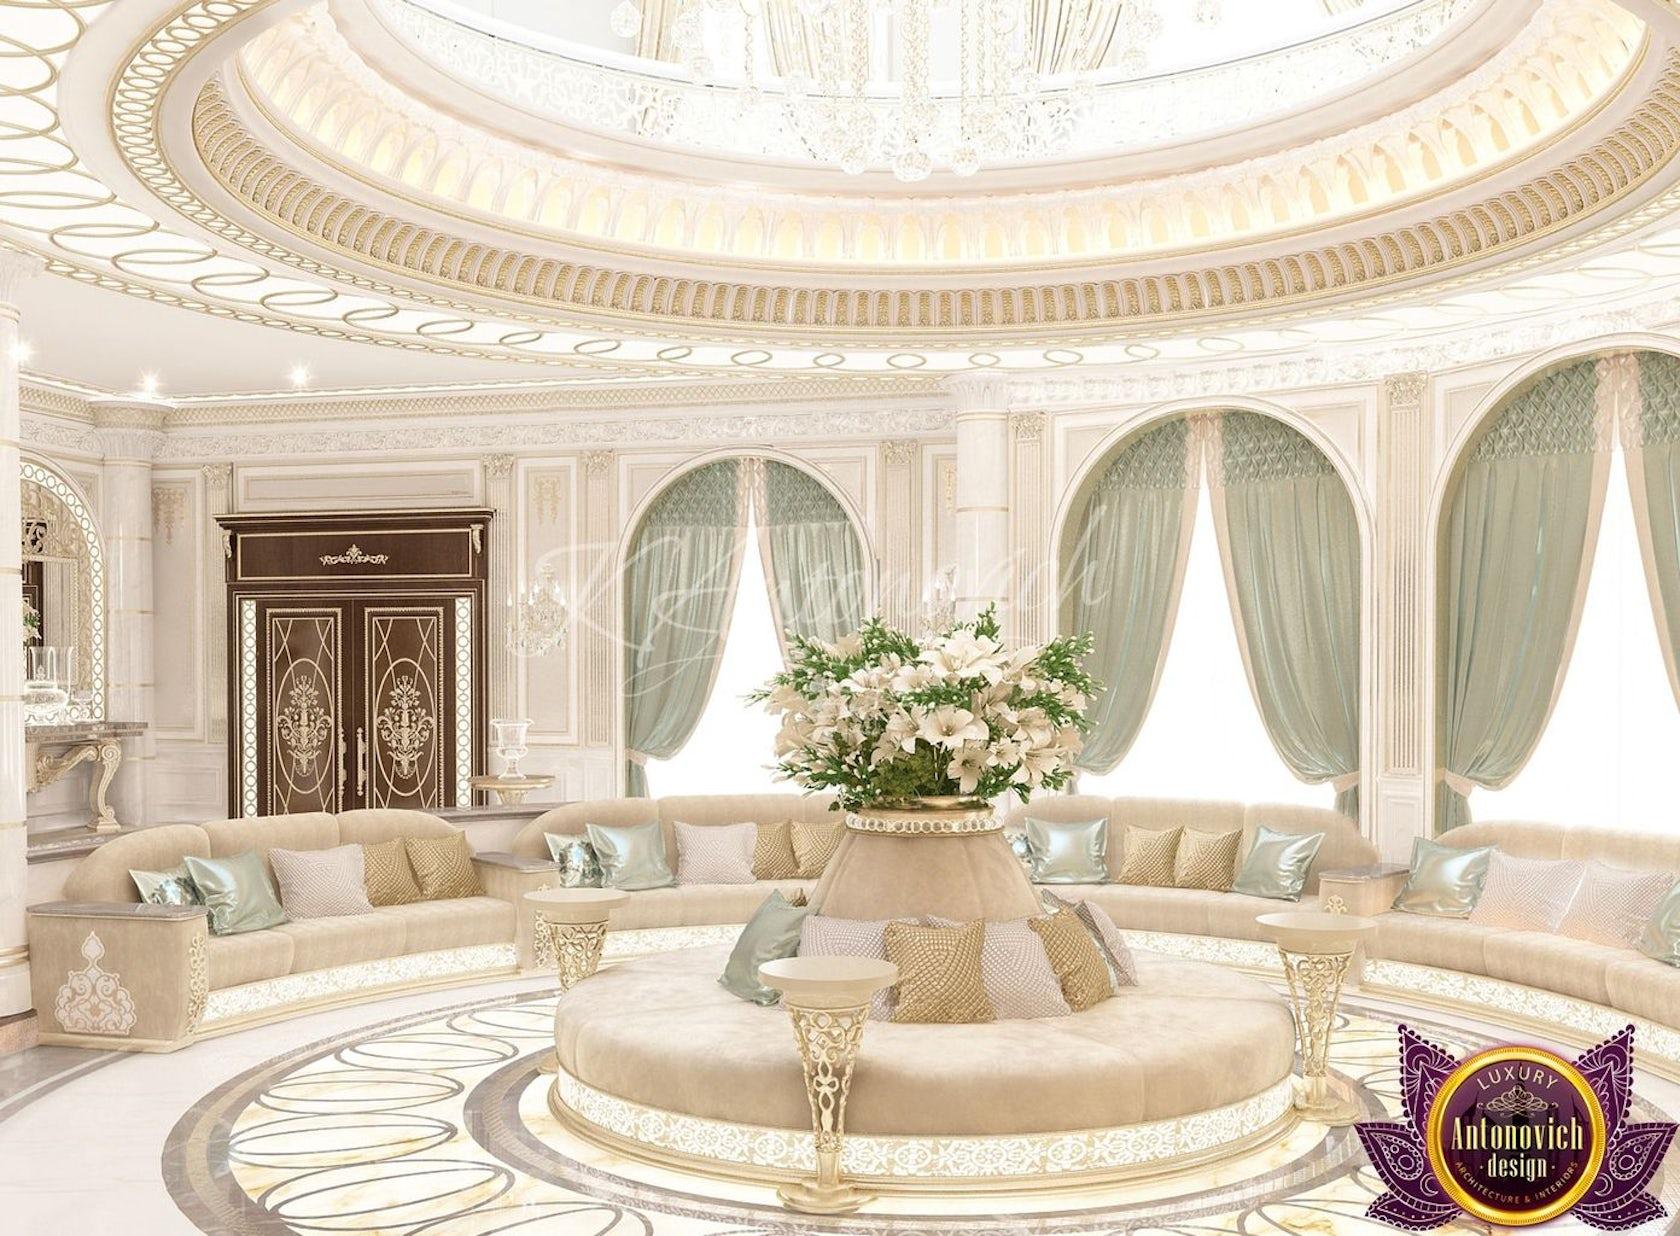 Kitchen Design Usa By Katrina Antonovich: Masterpiece Interior Design Of Katrina Antonovich